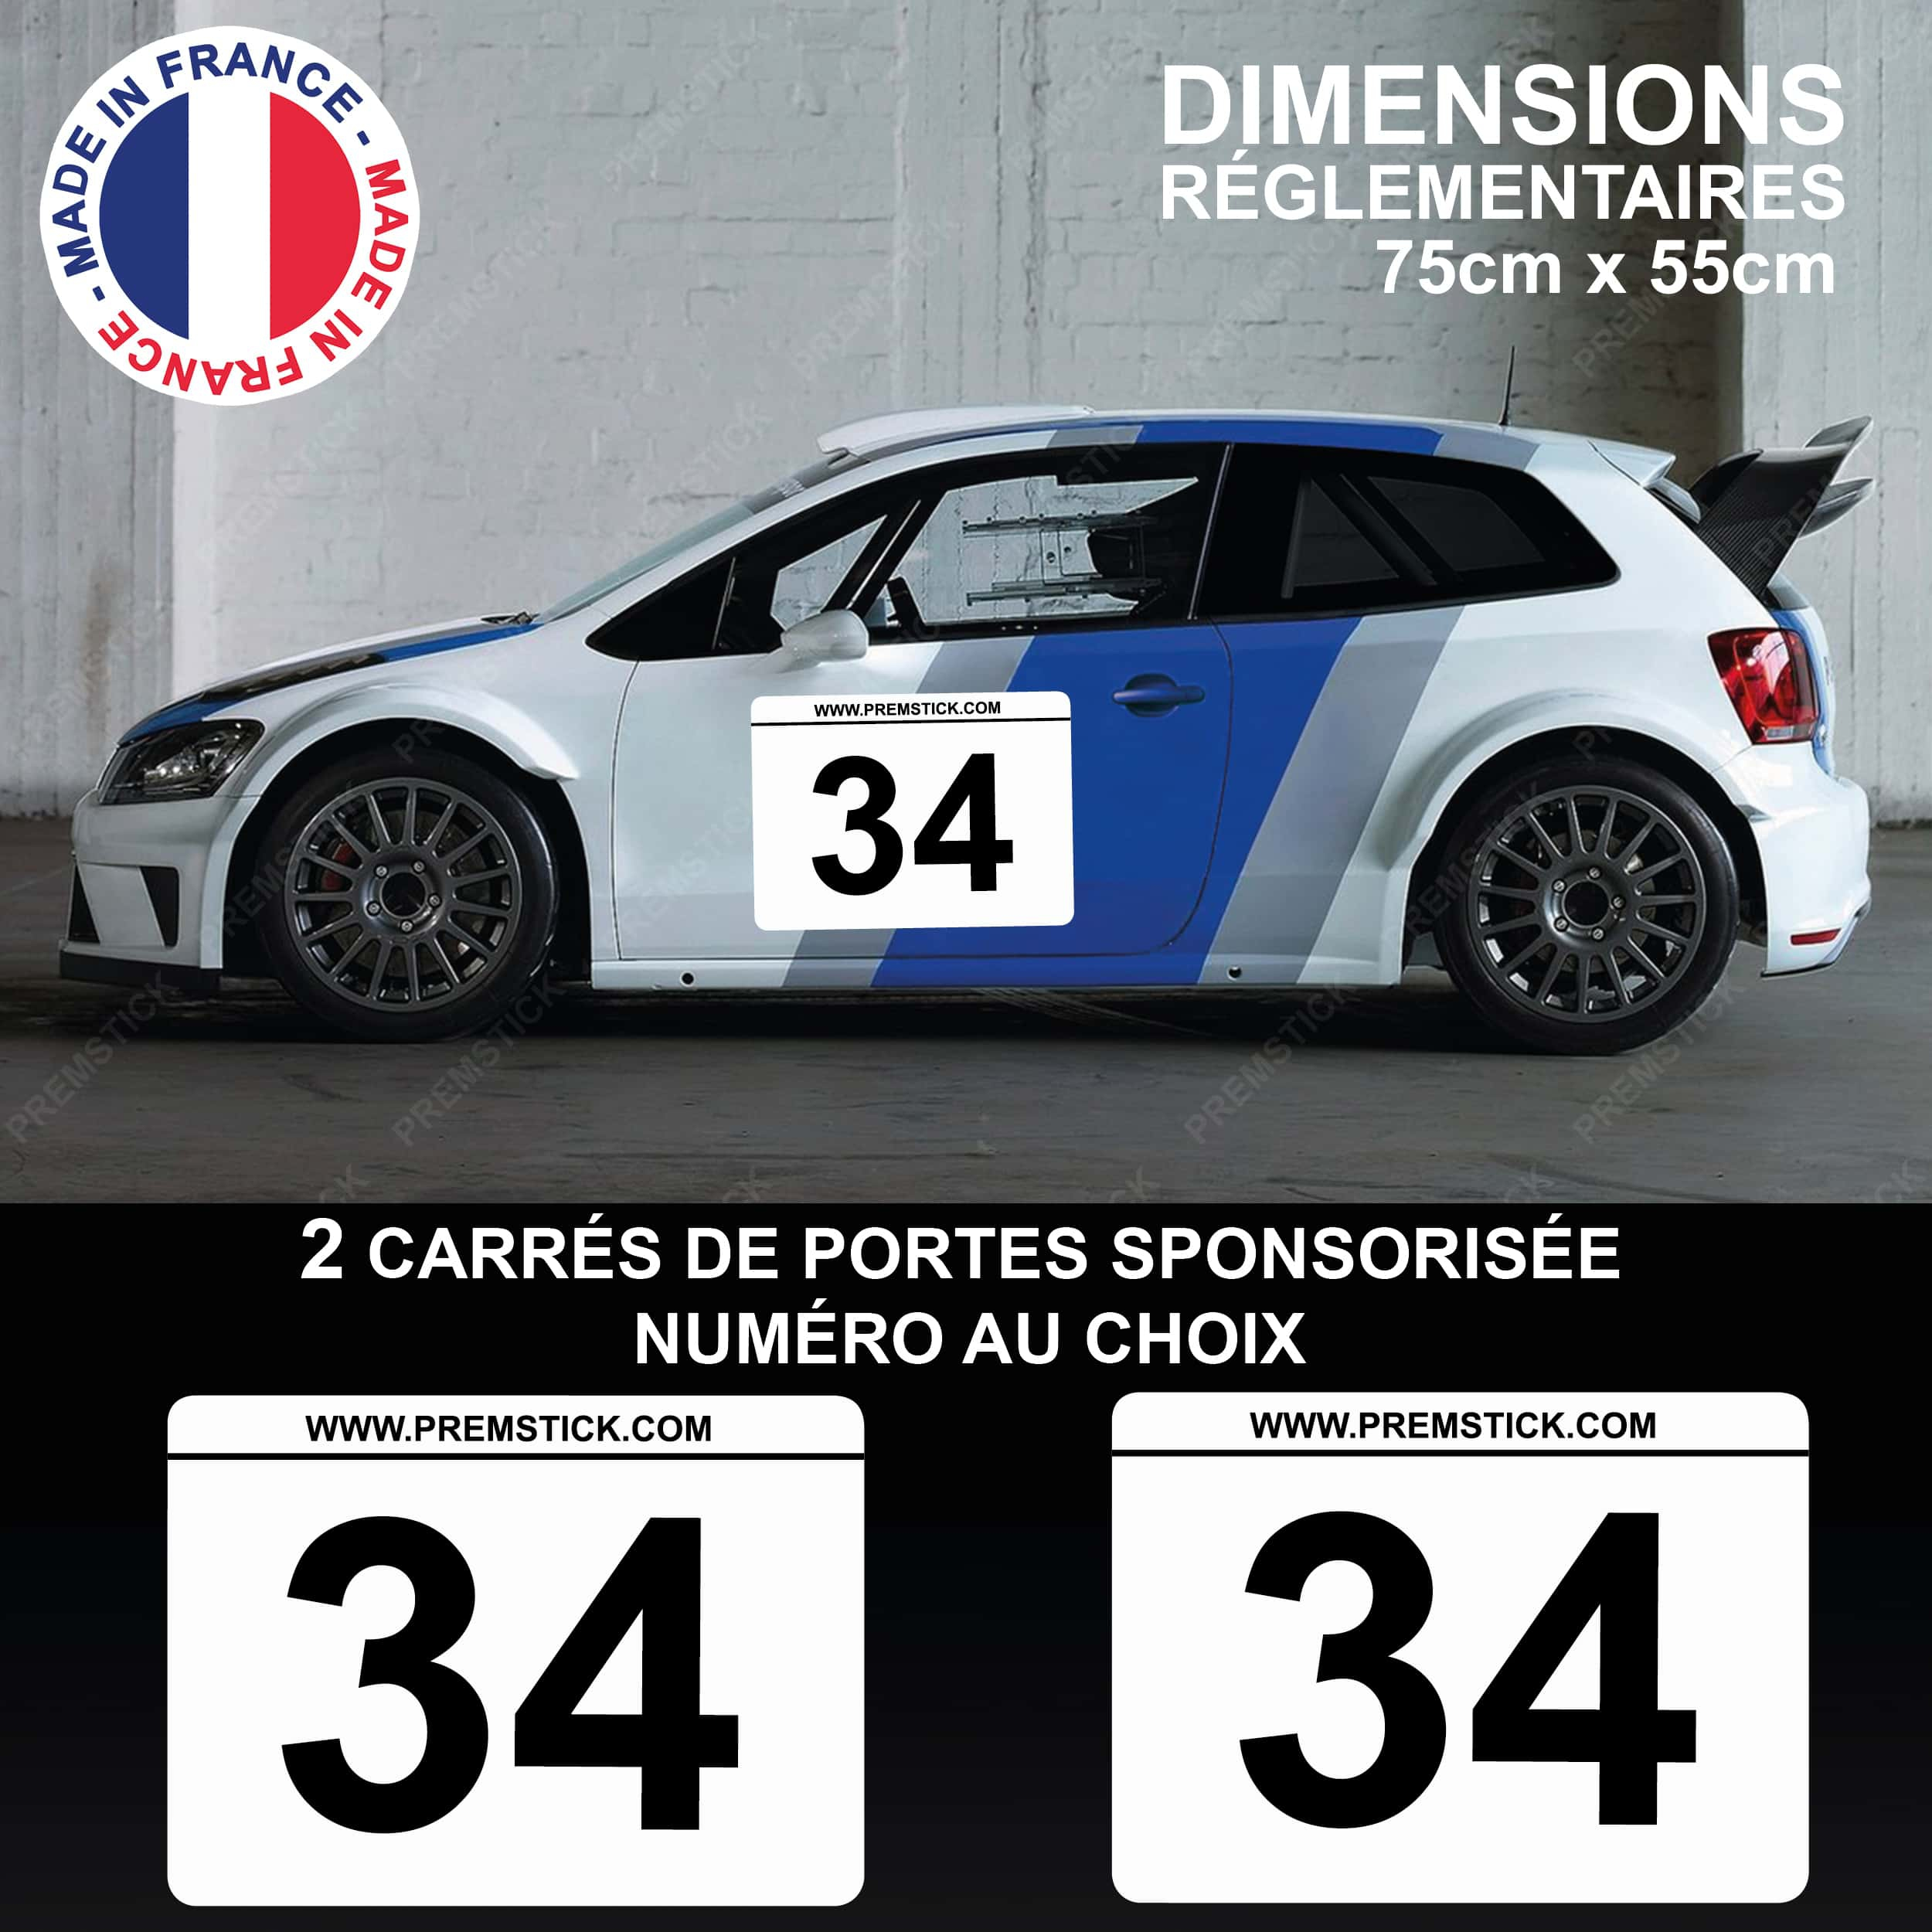 stickers-carre-de-porte-rallye-panneau-blanc-sponsorisé-numero-racing-voiture-auto-autocollant-sticker-ref4-min